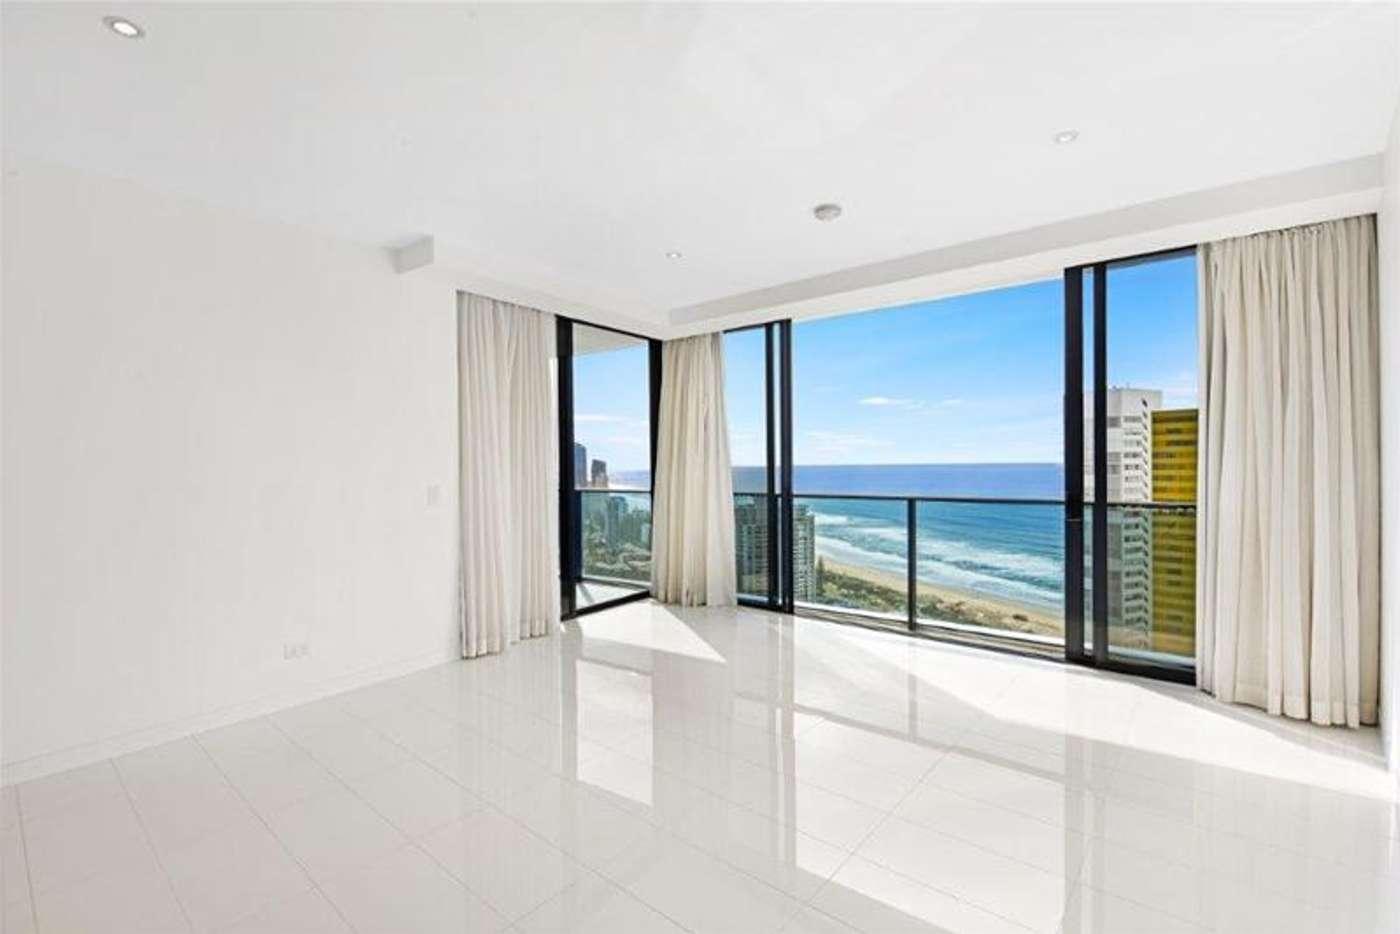 Fifth view of Homely apartment listing, 3802/21 Elizabeth Avenue, Broadbeach QLD 4218